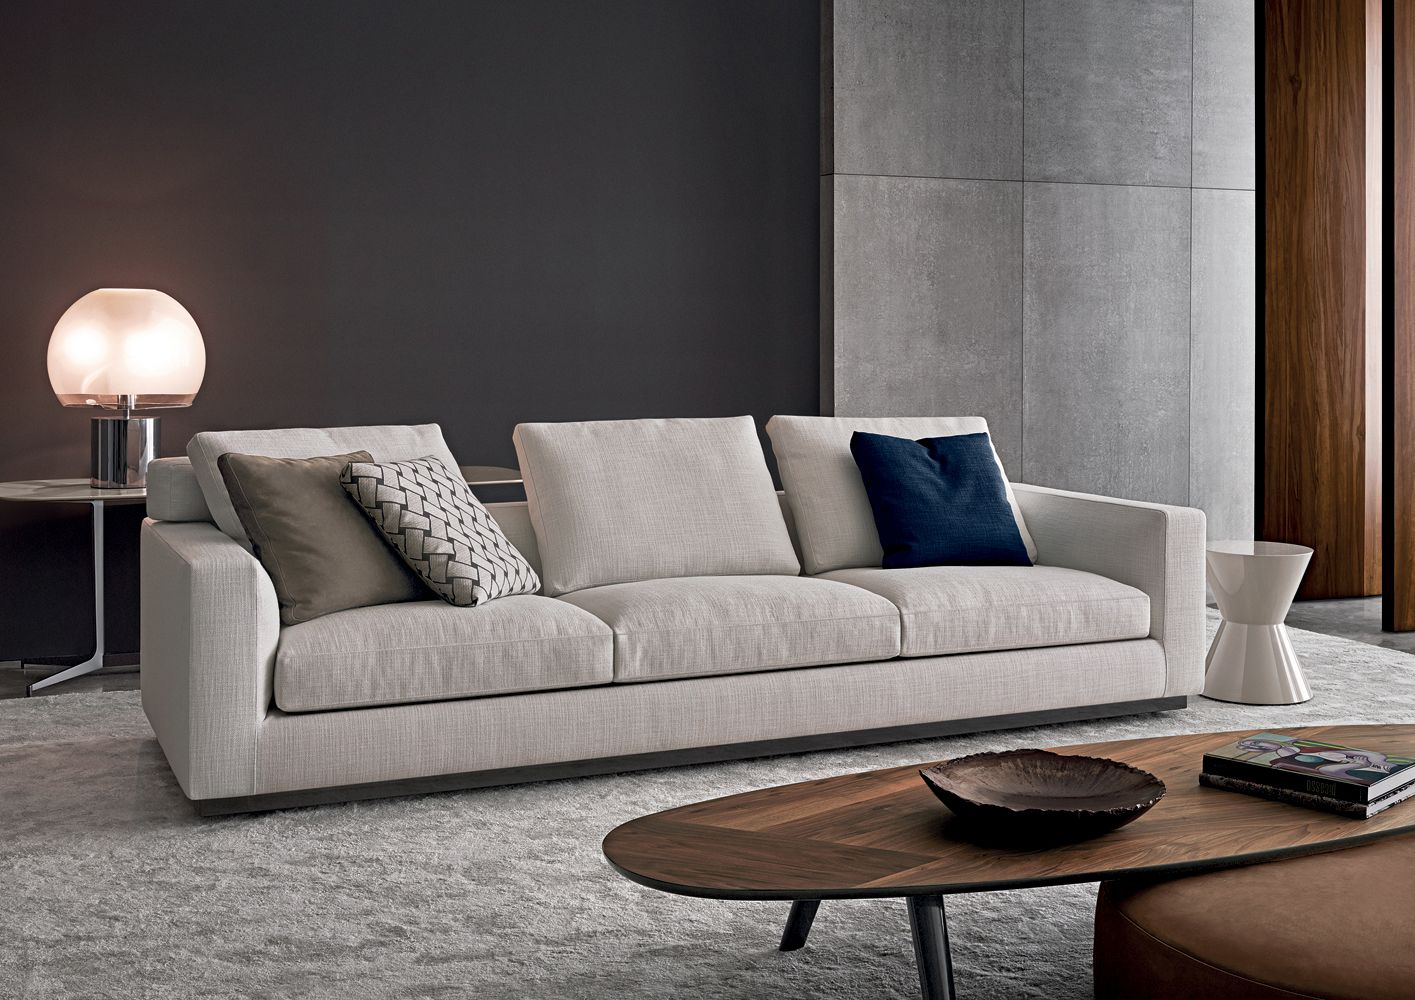 Andersenline8 Rodolfodordoni Minotti Orangeskin Jpg 1415 1000 Sofa Luxury Sofa Sofa Design